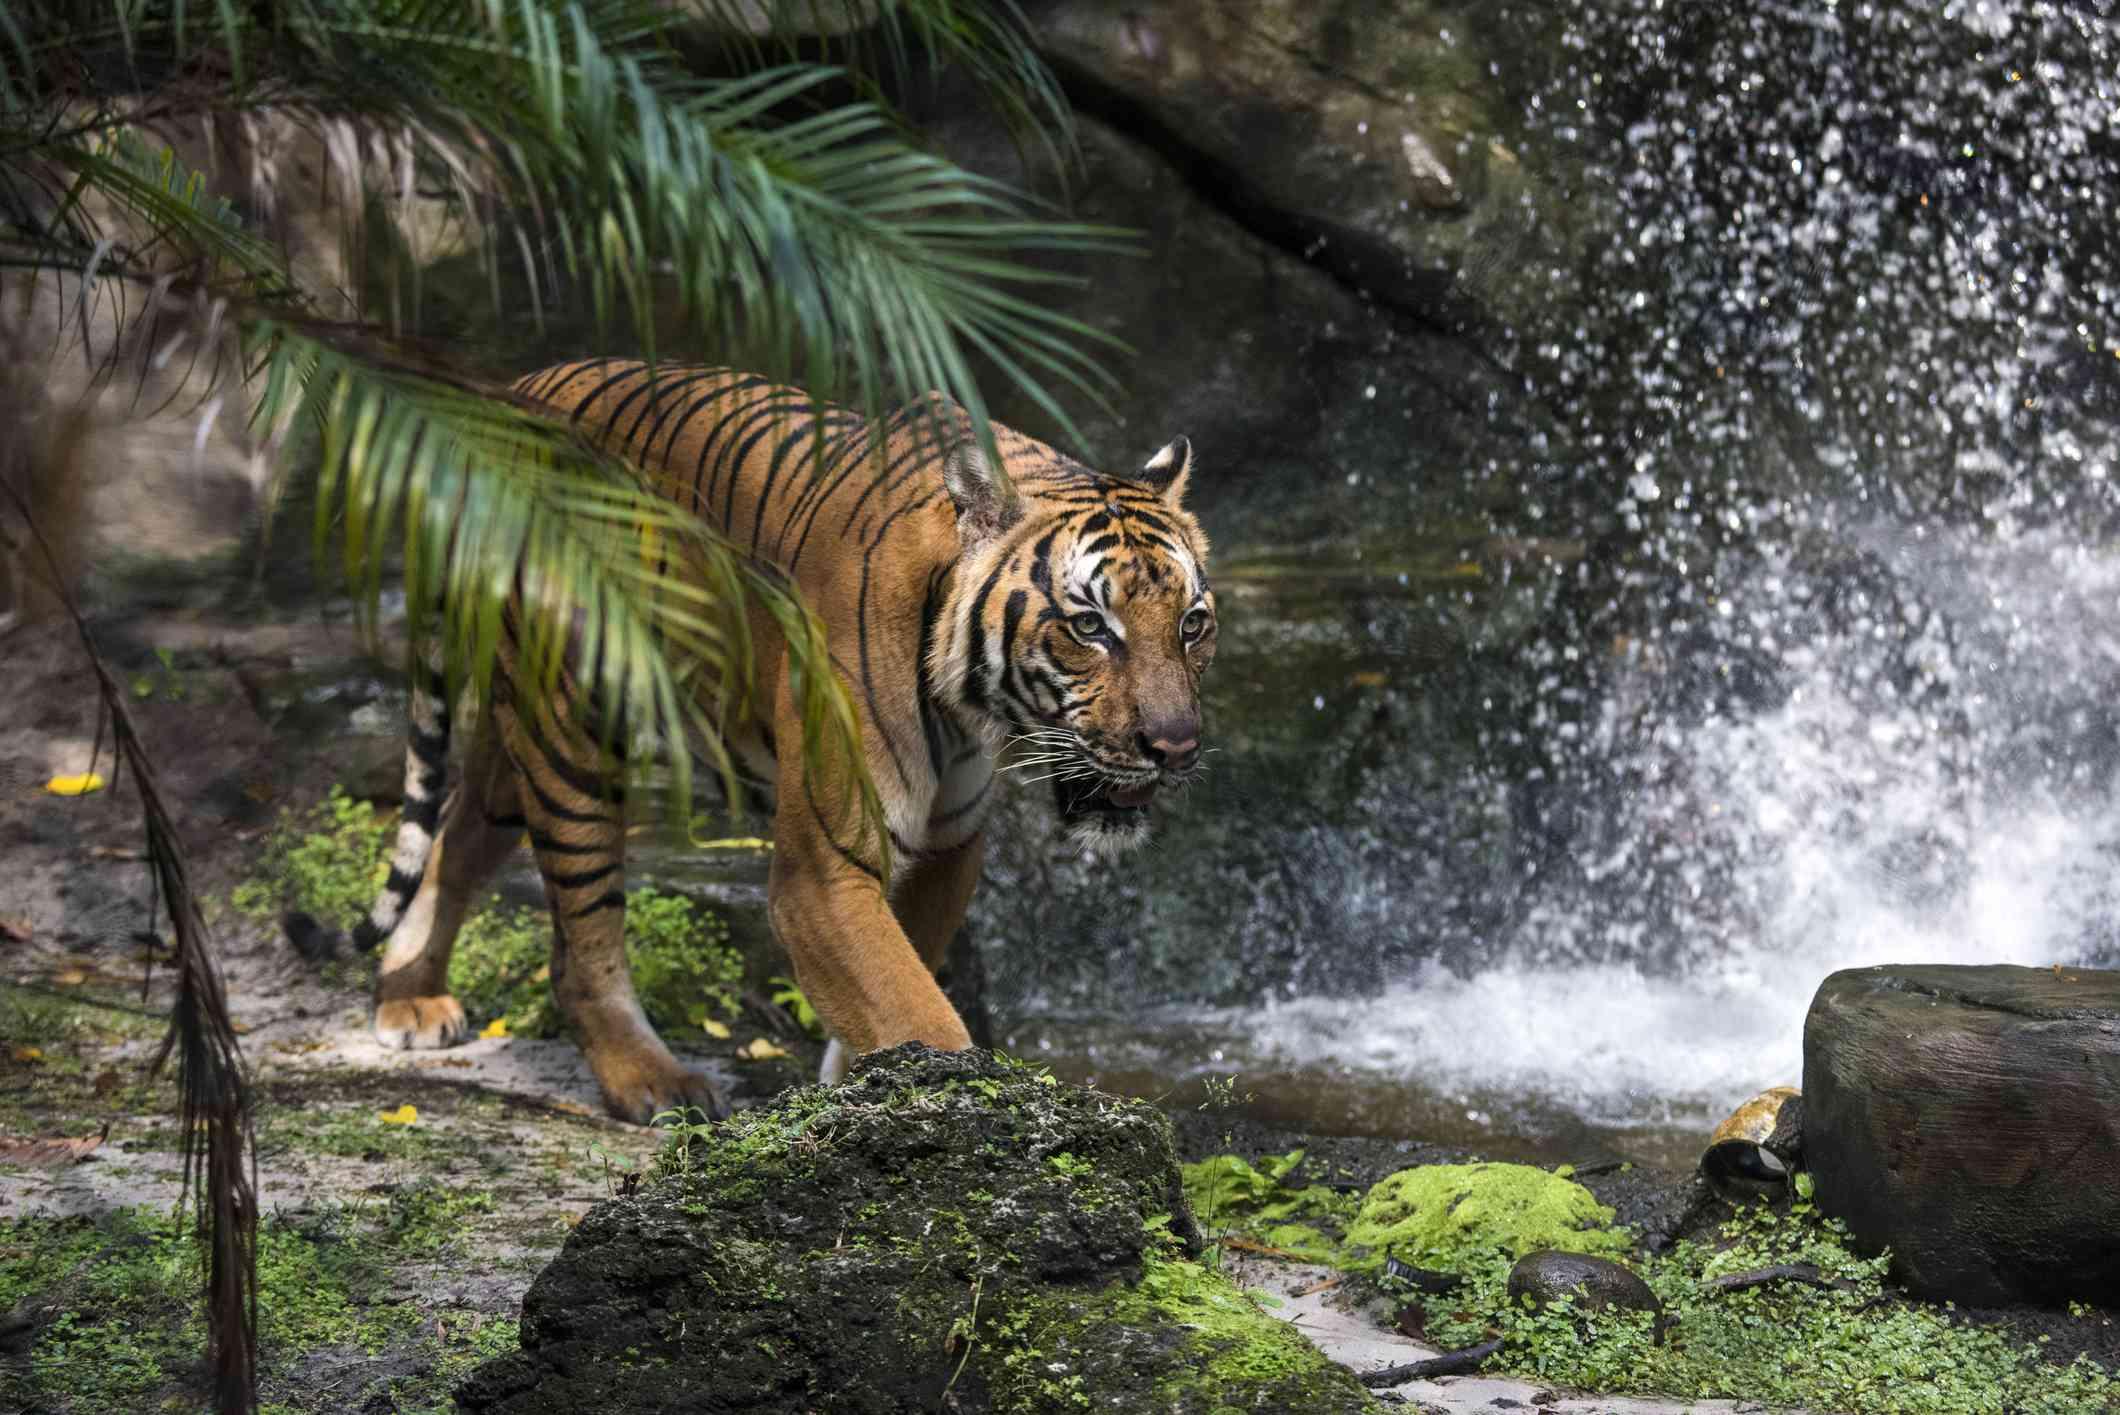 A Malayan tiger near a waterfall